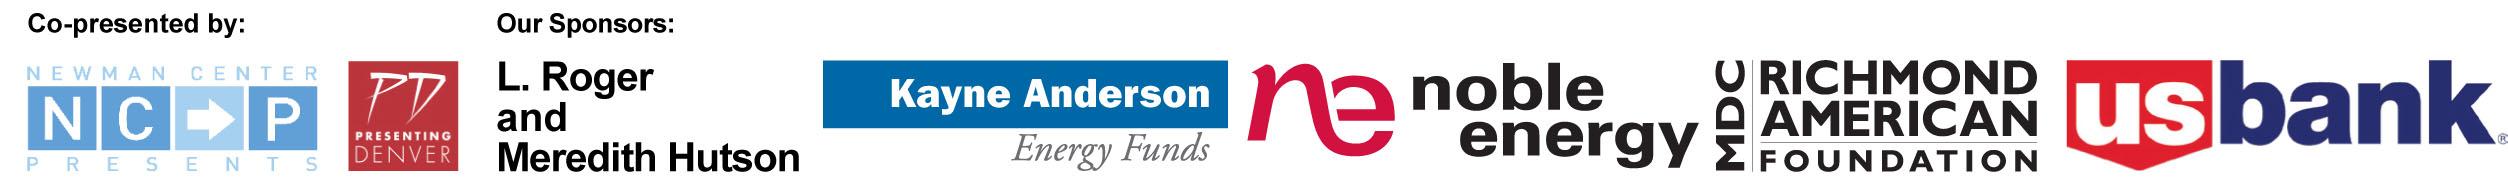 Co-presenter and Sponsor logos